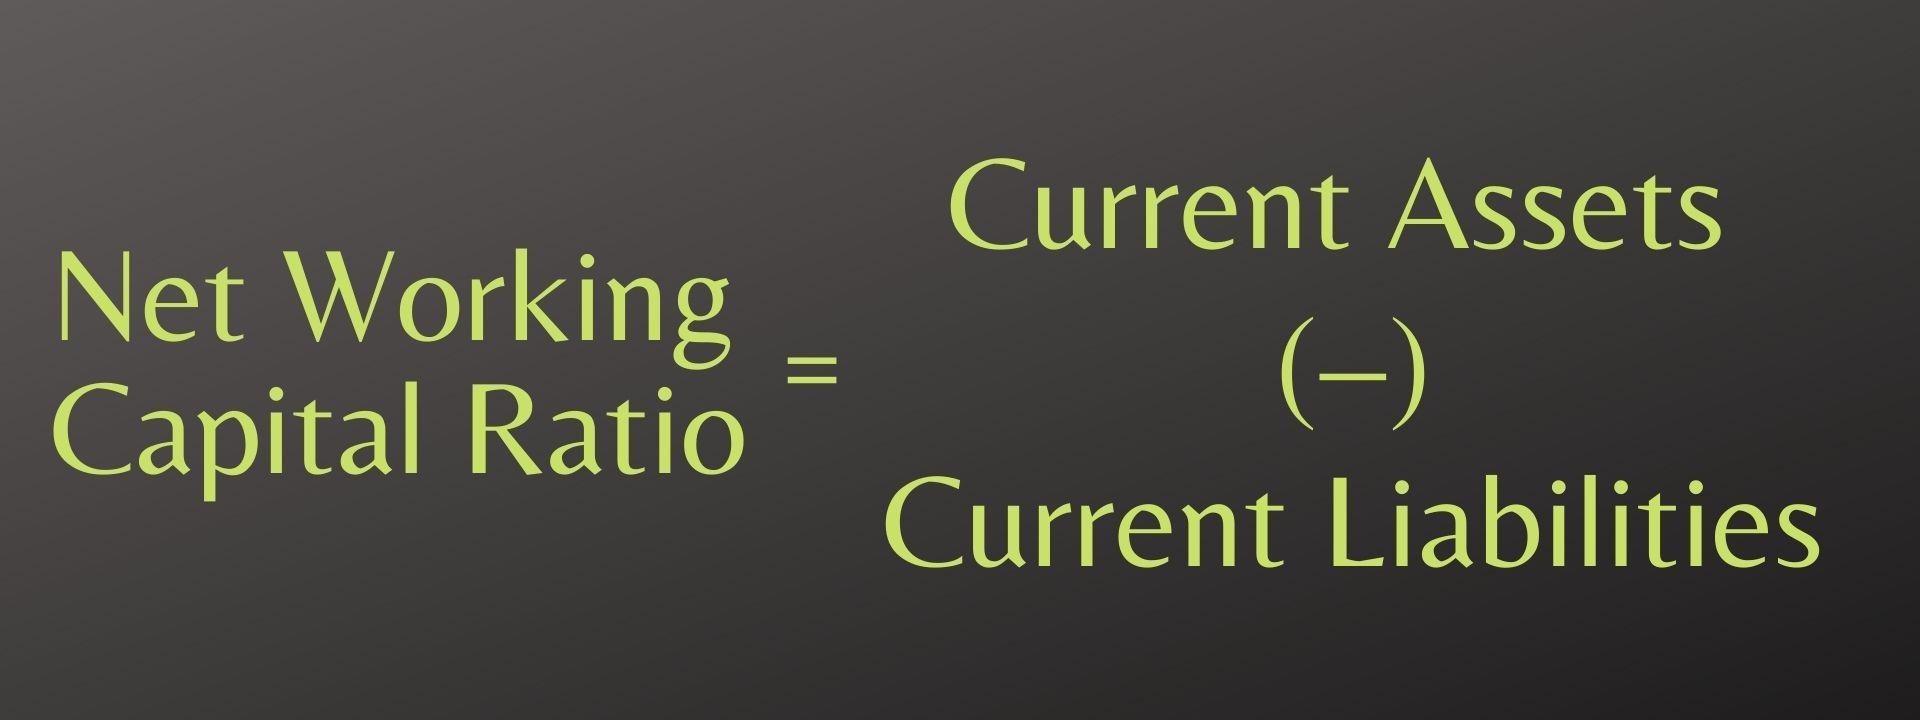 Net Working Capital Ratio